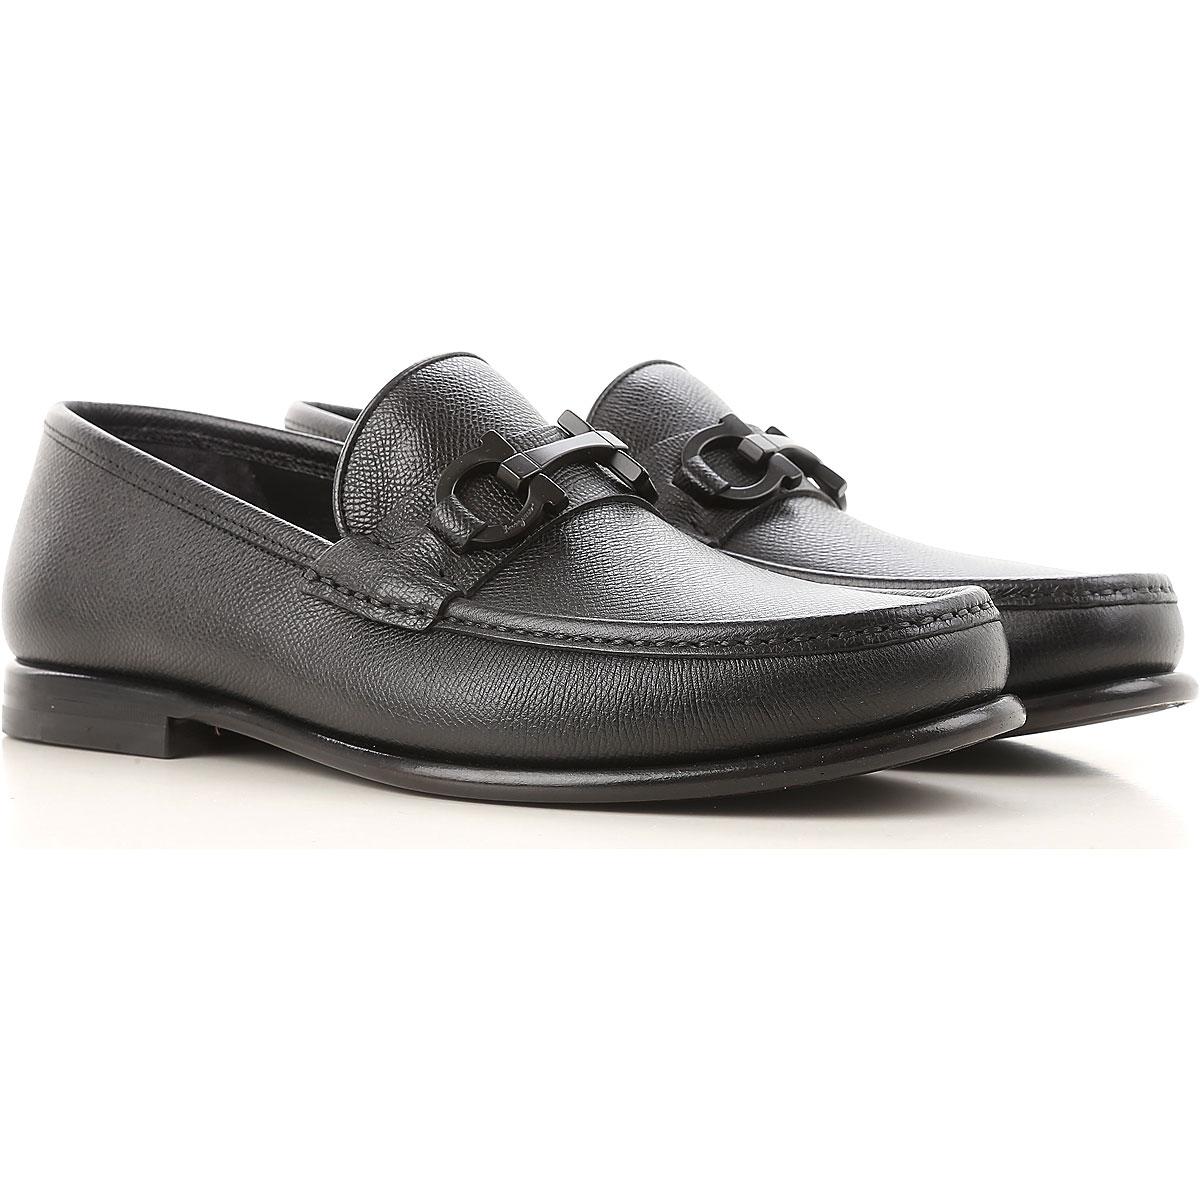 Image of Salvatore Ferragamo Loafers for Men On Sale, Black, Leather, 2017, 7.5 8 8.5 9.5